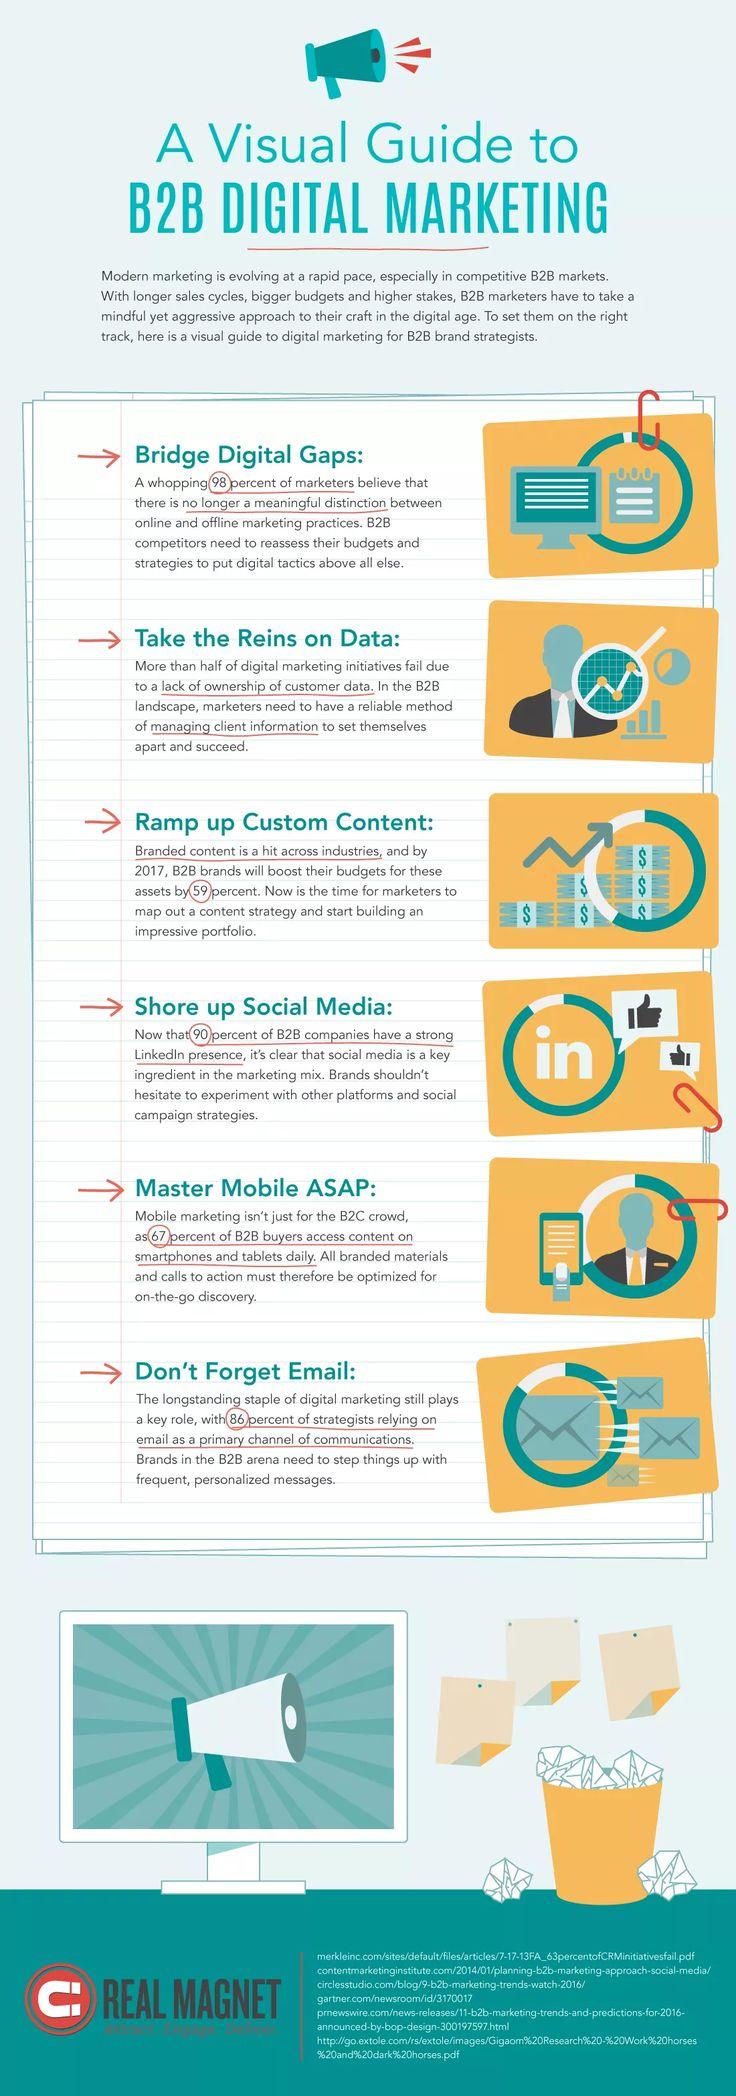 Creating a b2b digital marketing plan for 2017 infographic smart - A Visual Guide To B2b Digital Marketing Infographic